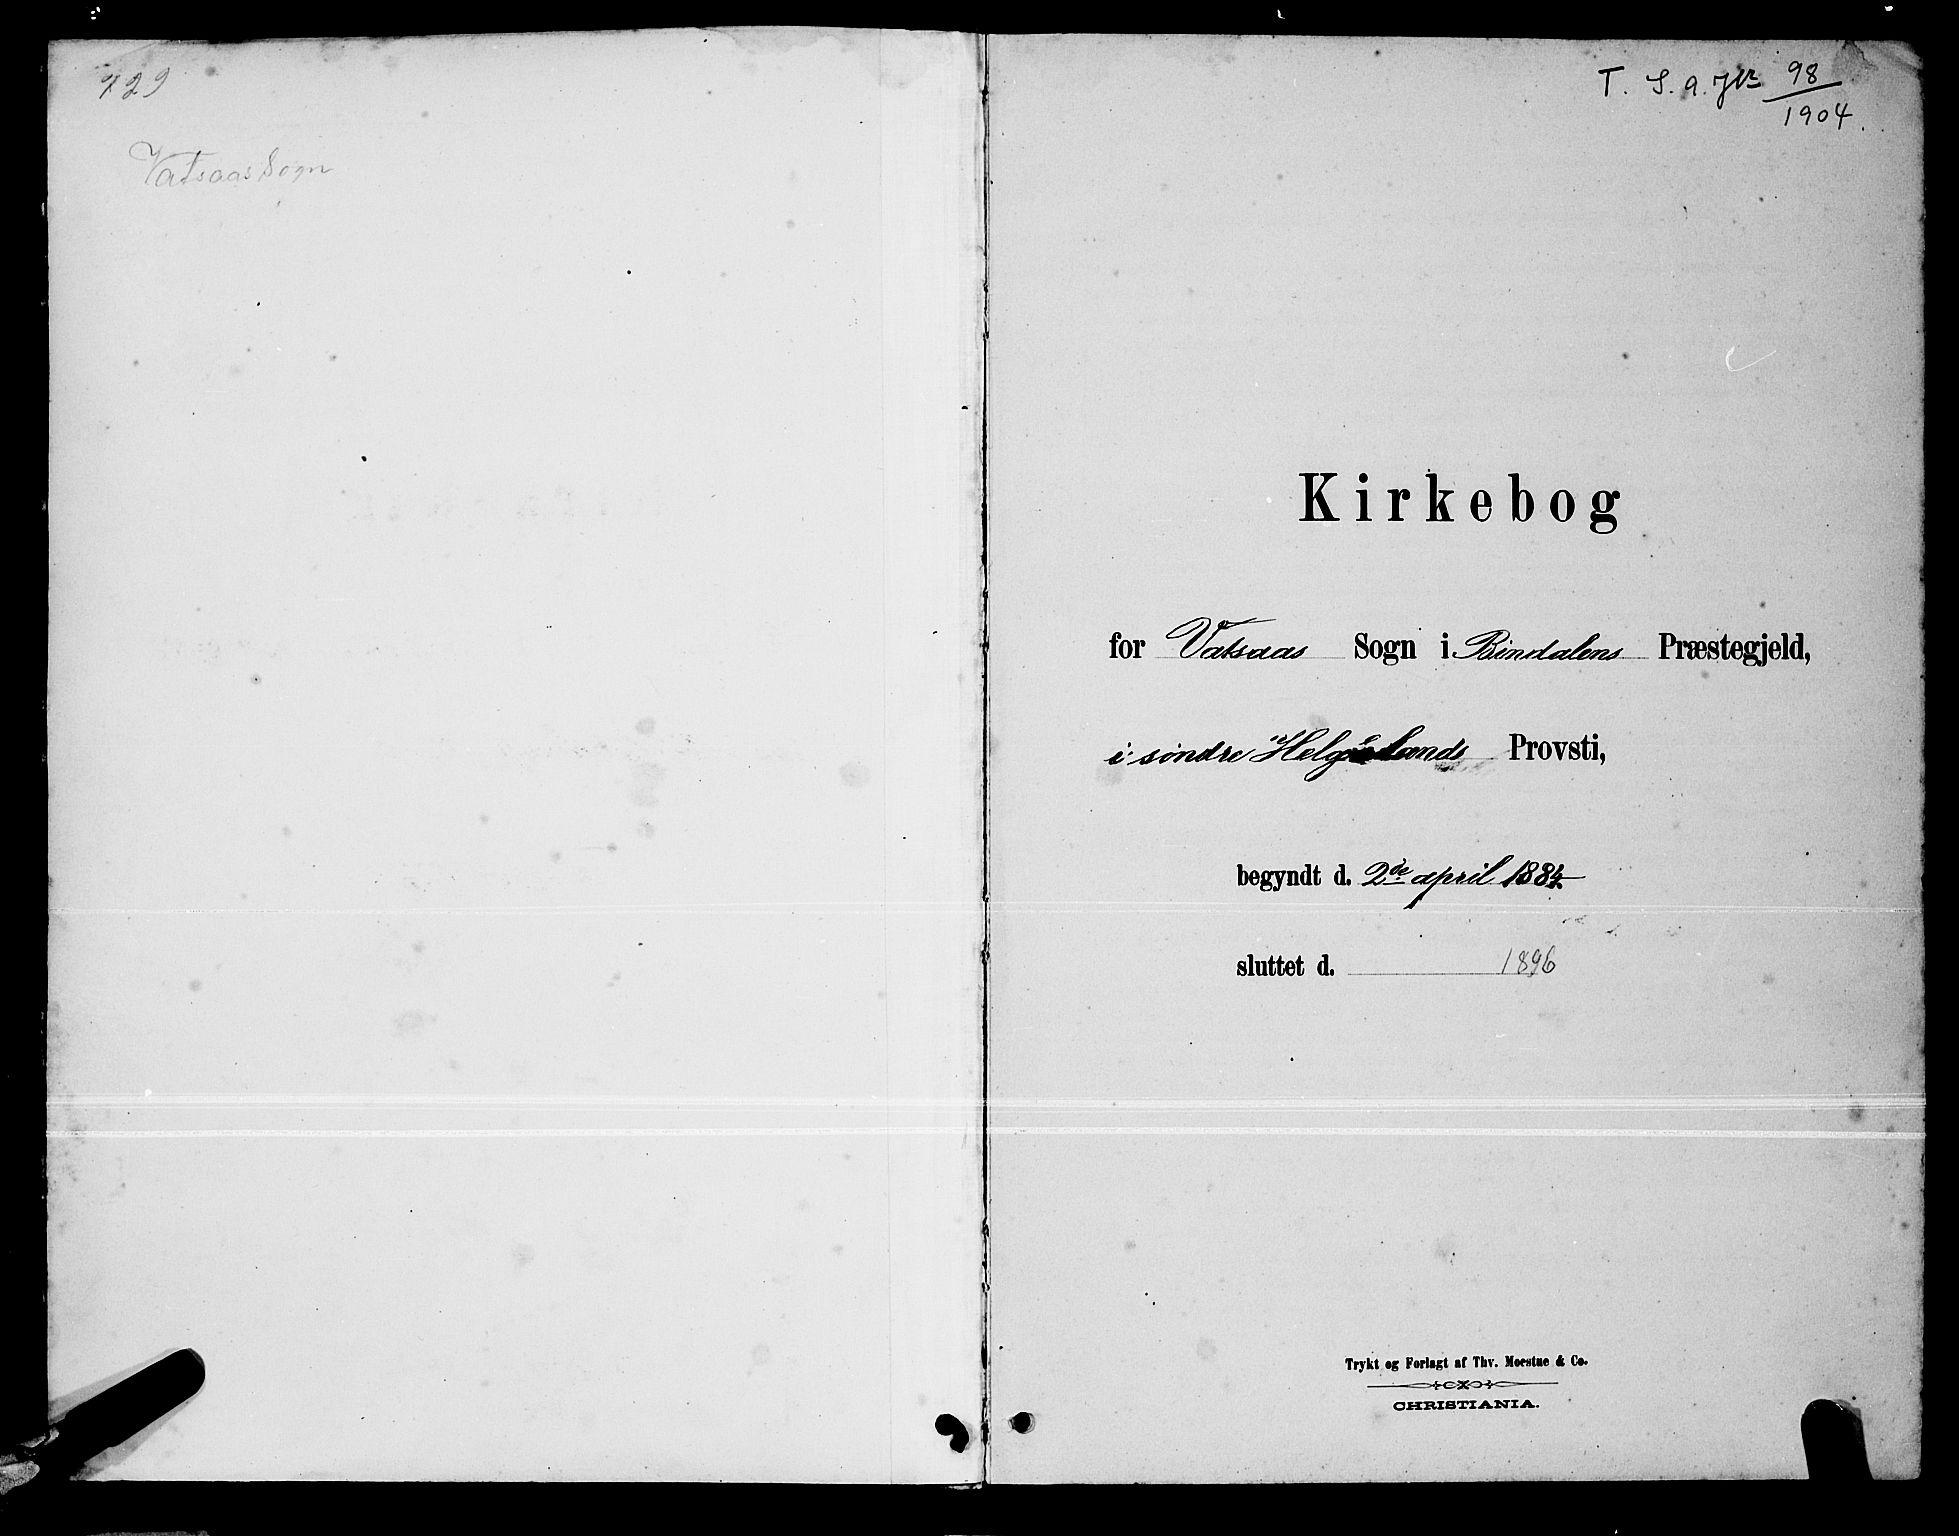 SAT, Ministerialprotokoller, klokkerbøker og fødselsregistre - Nordland, 810/L0160: Klokkerbok nr. 810C03, 1884-1896